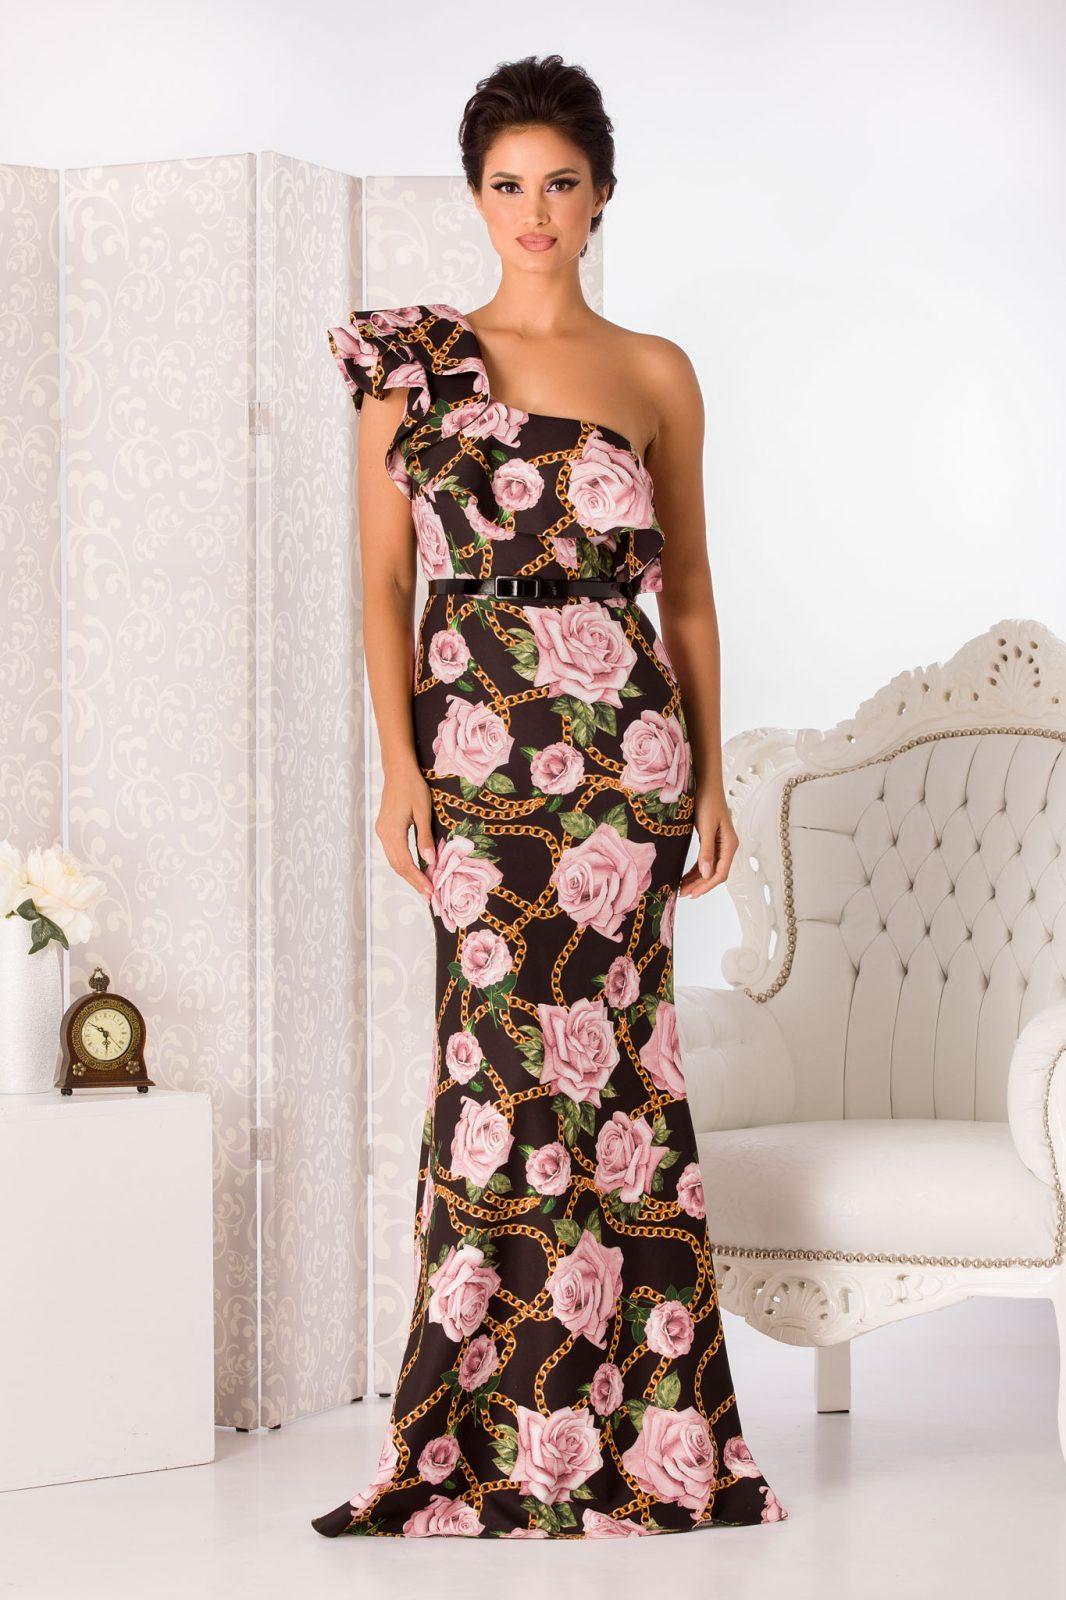 Rossa Floral Dress